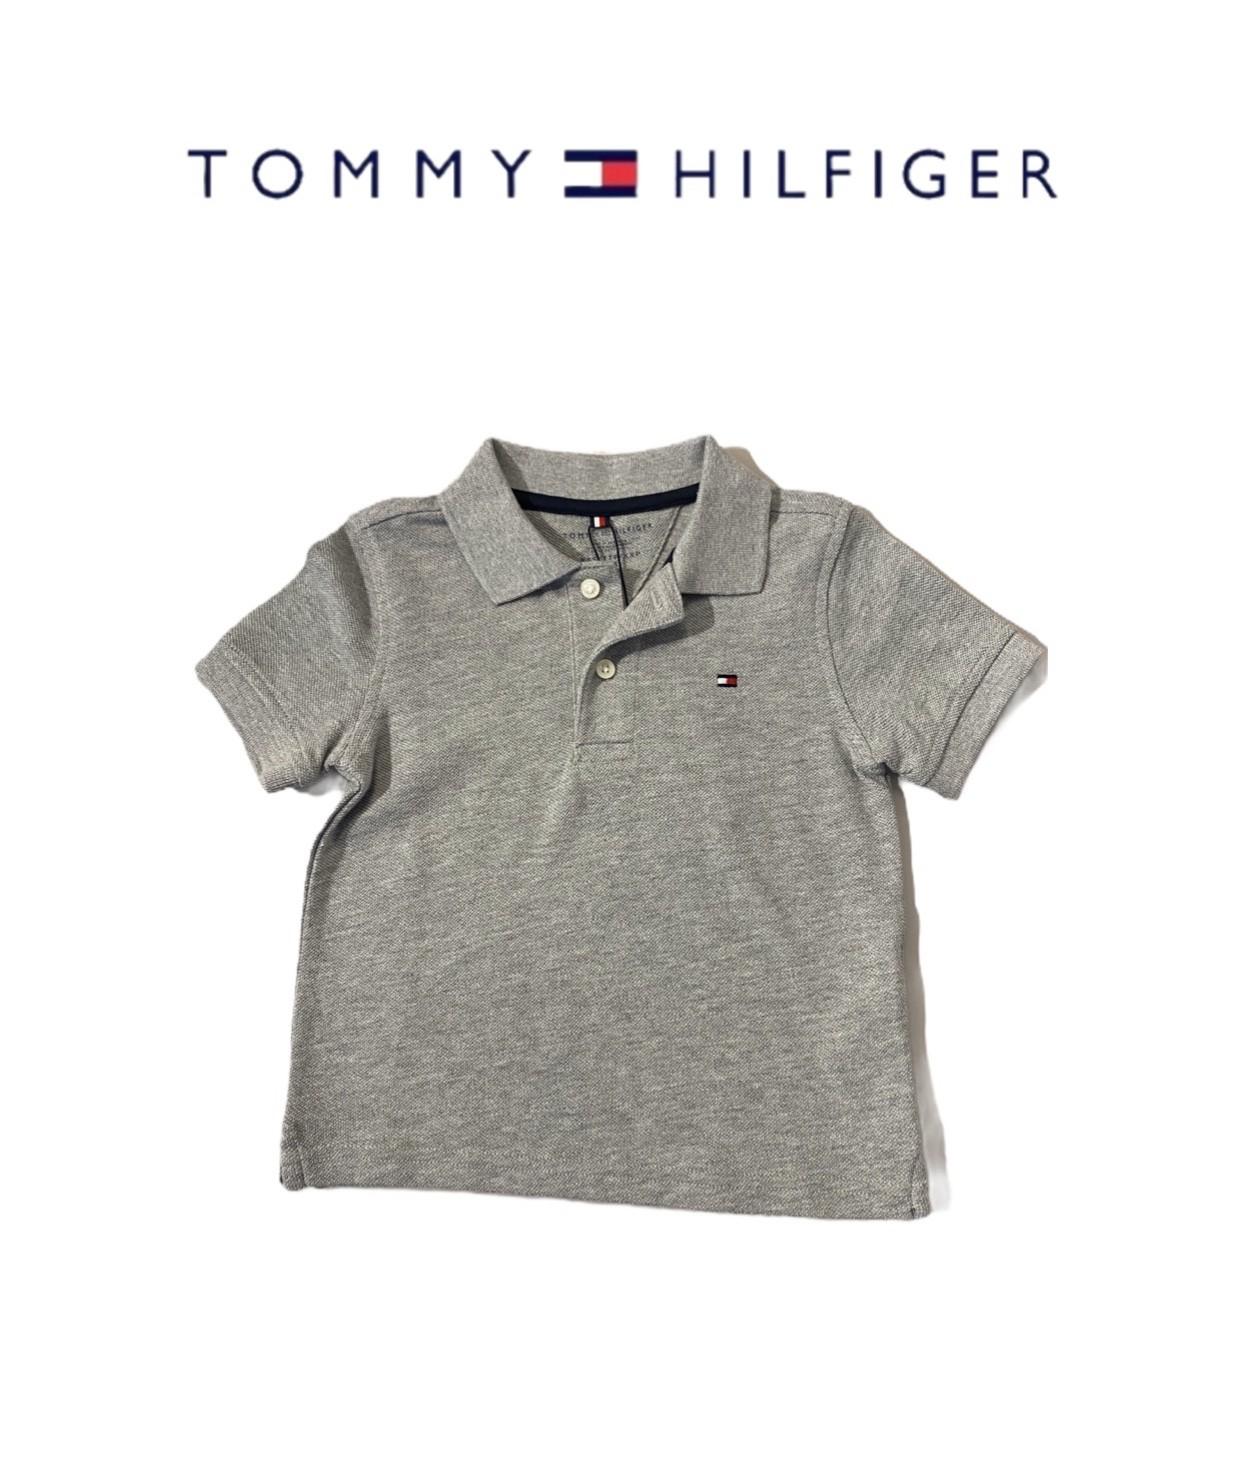 POLO TOMMY HILFIGER® CINZA